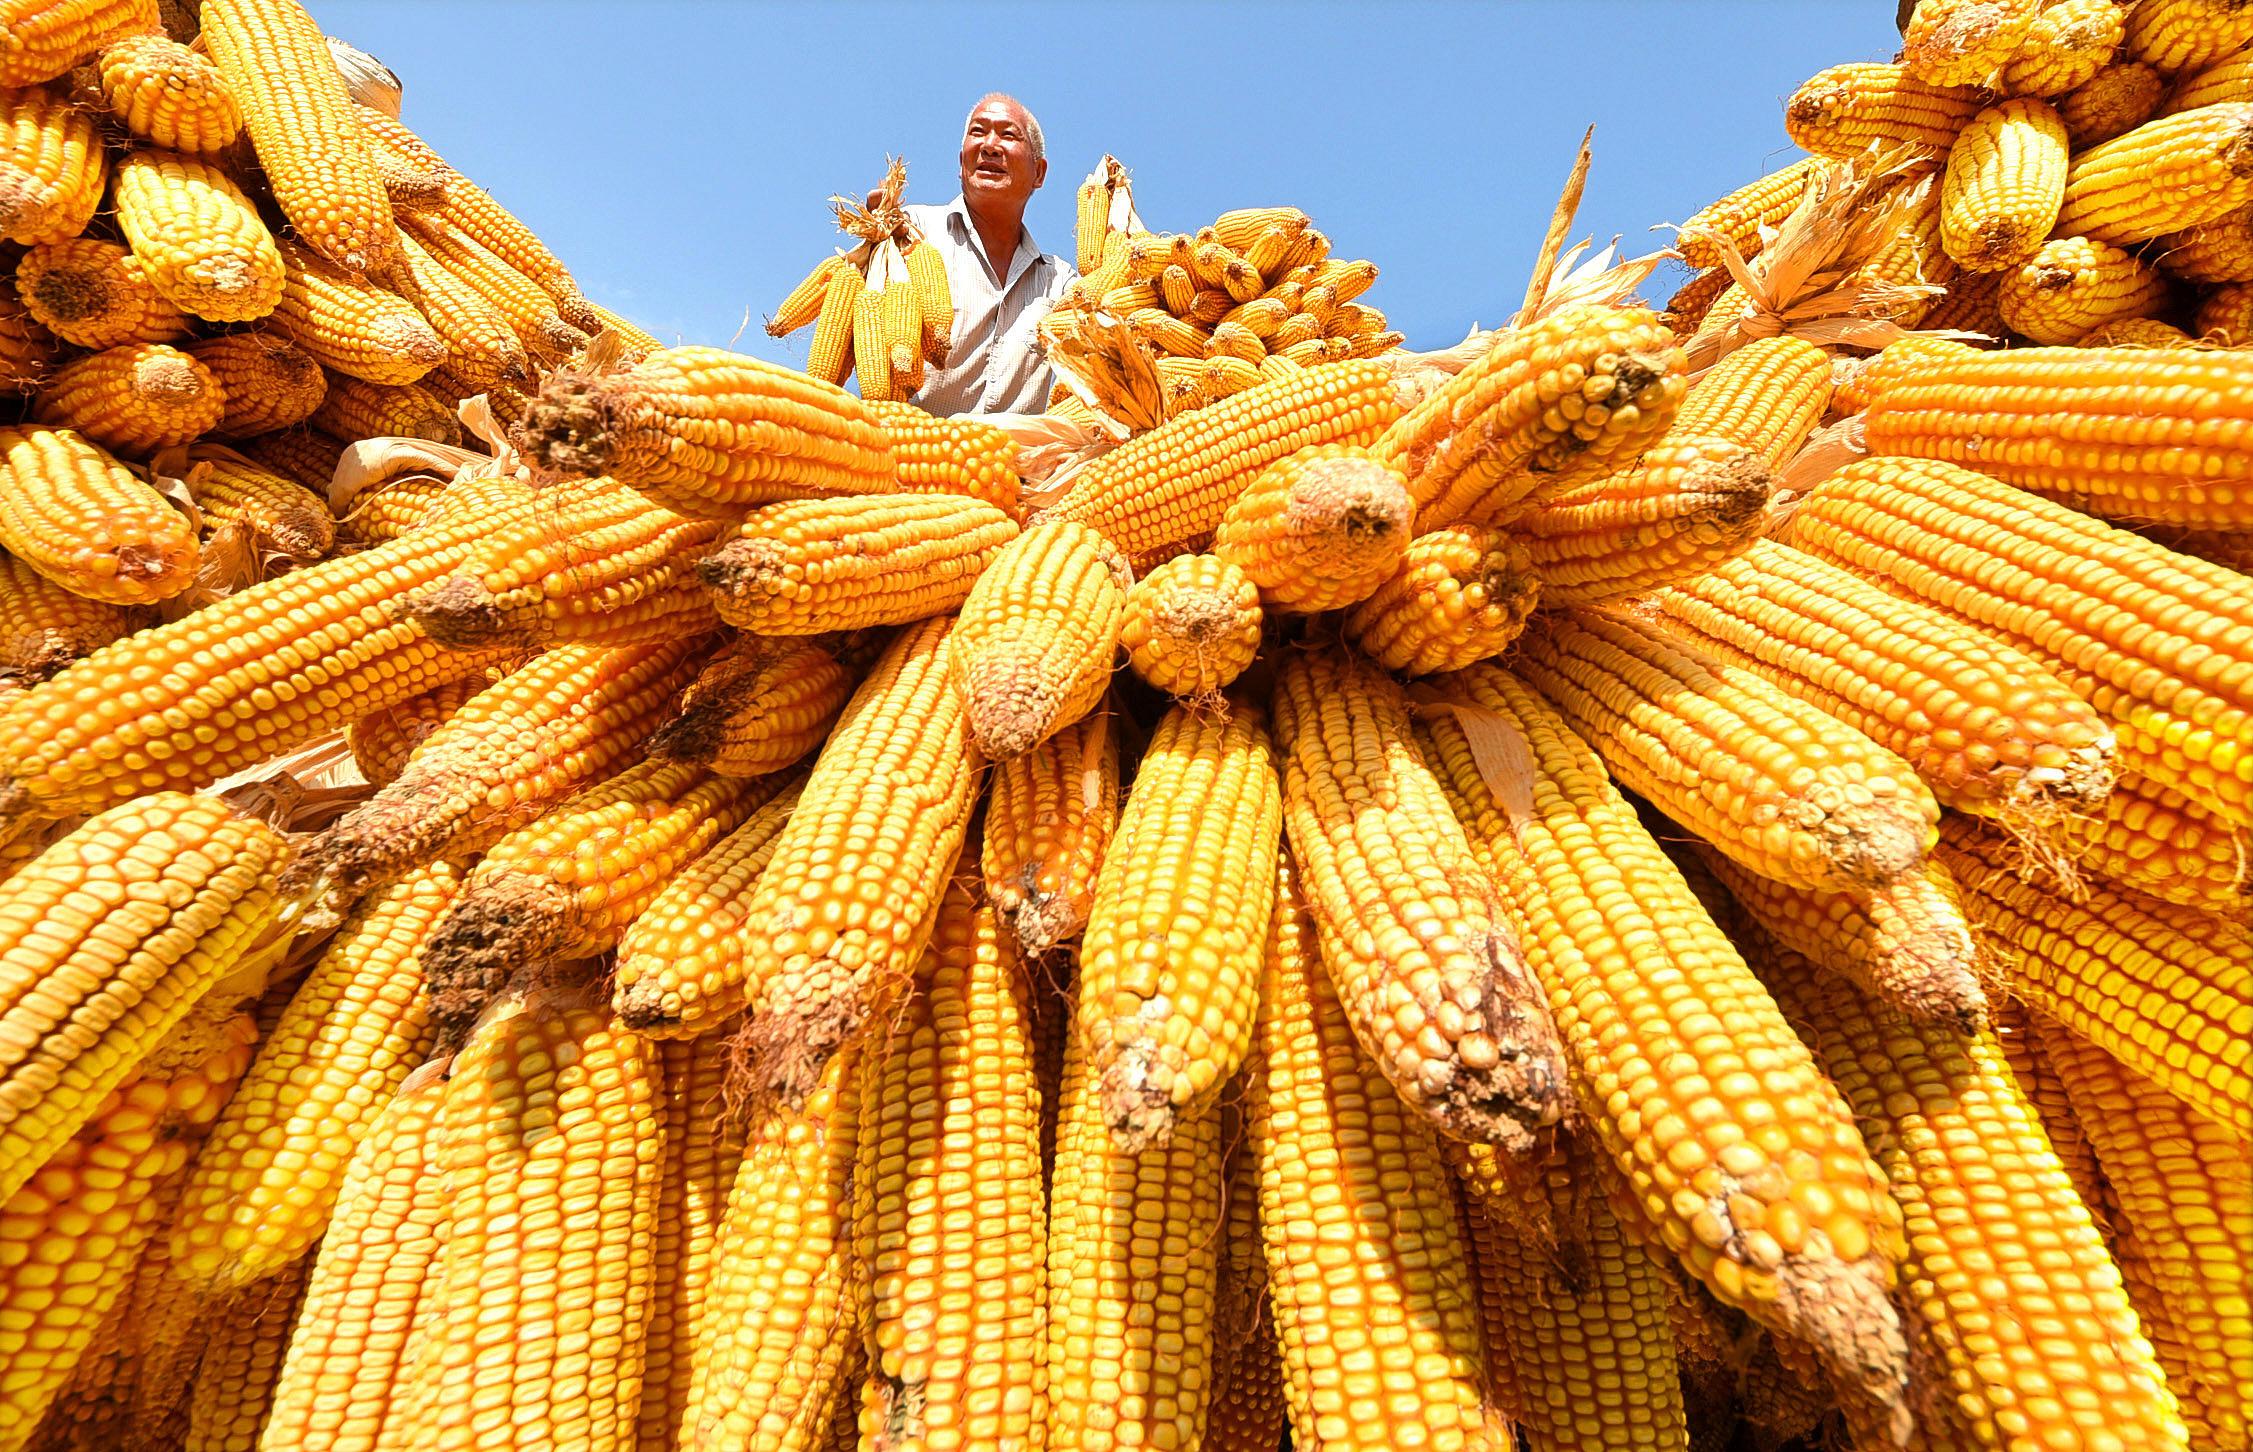 Farmers harvest corn in Zibo, Shandong province, on Sept. 7, 2018. Photo: VCG